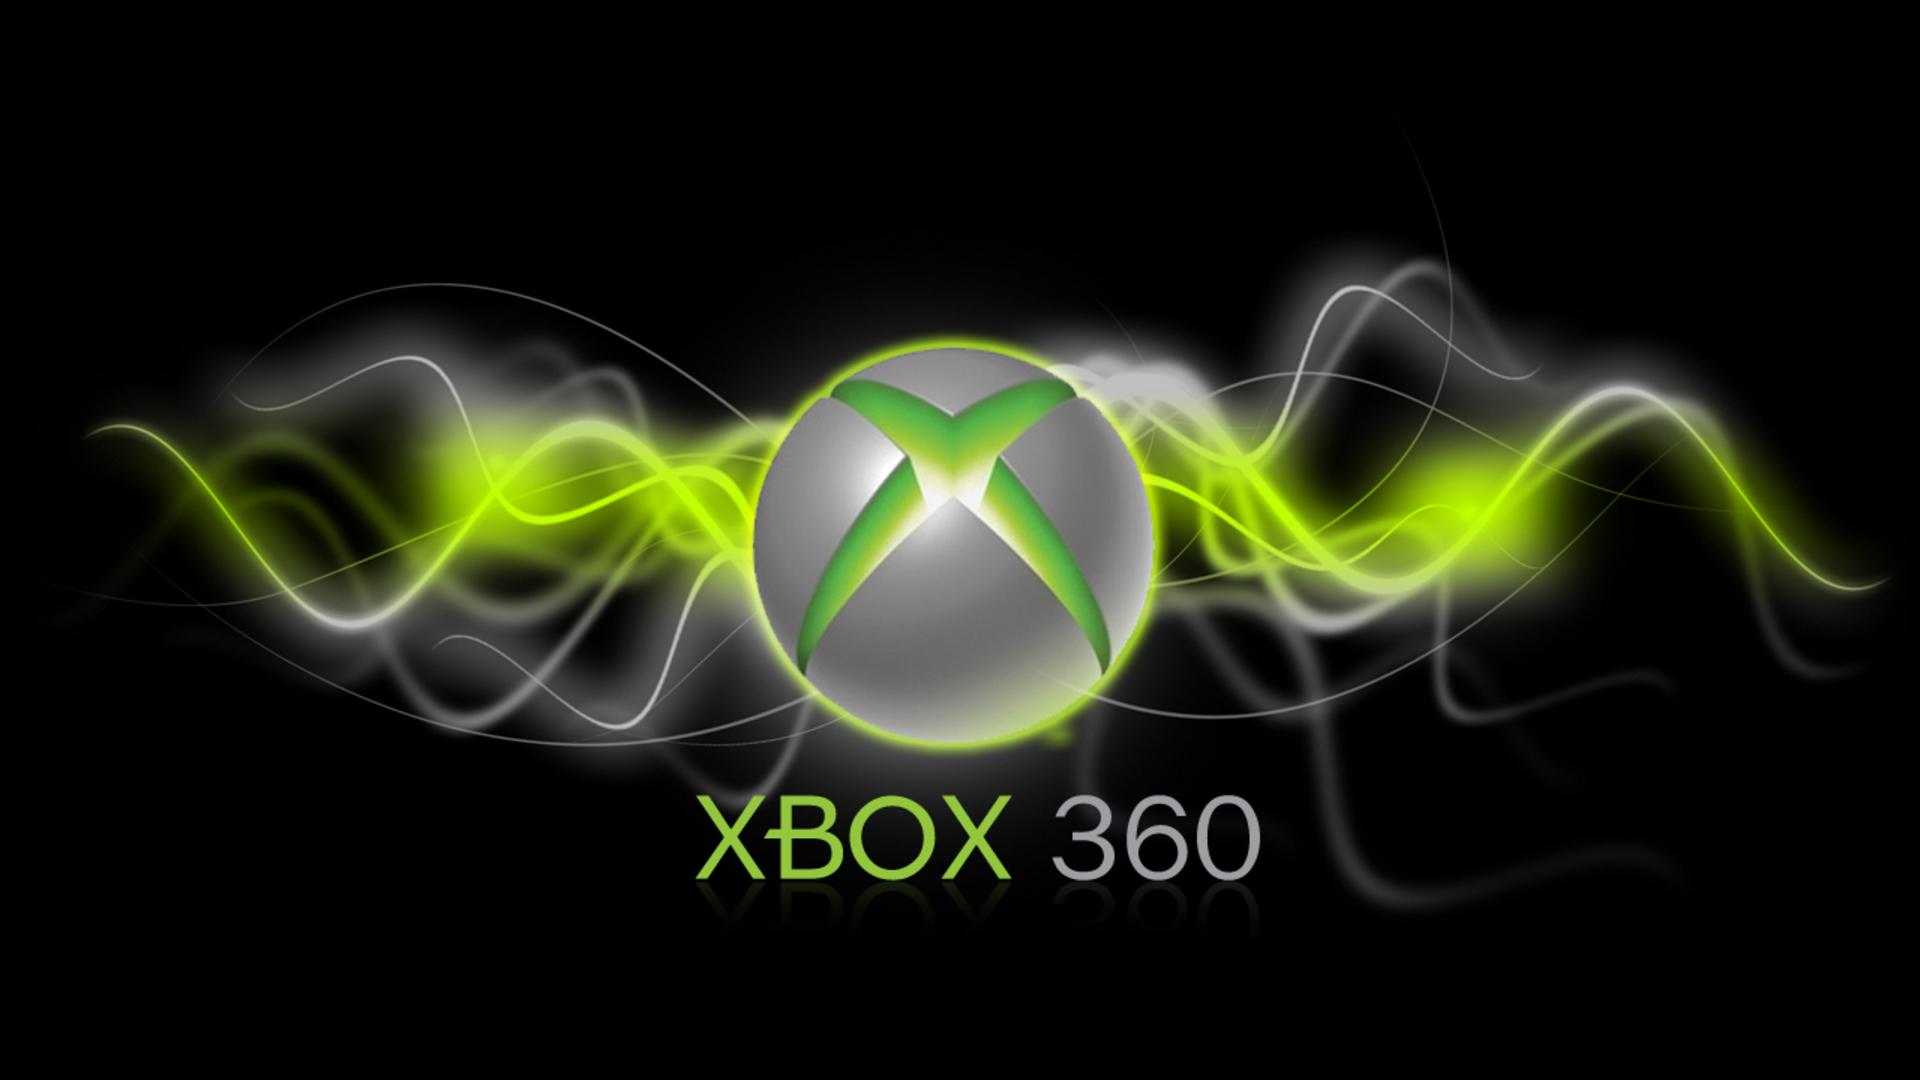 xbox 360 wallpaper downloads - wallpapersafari